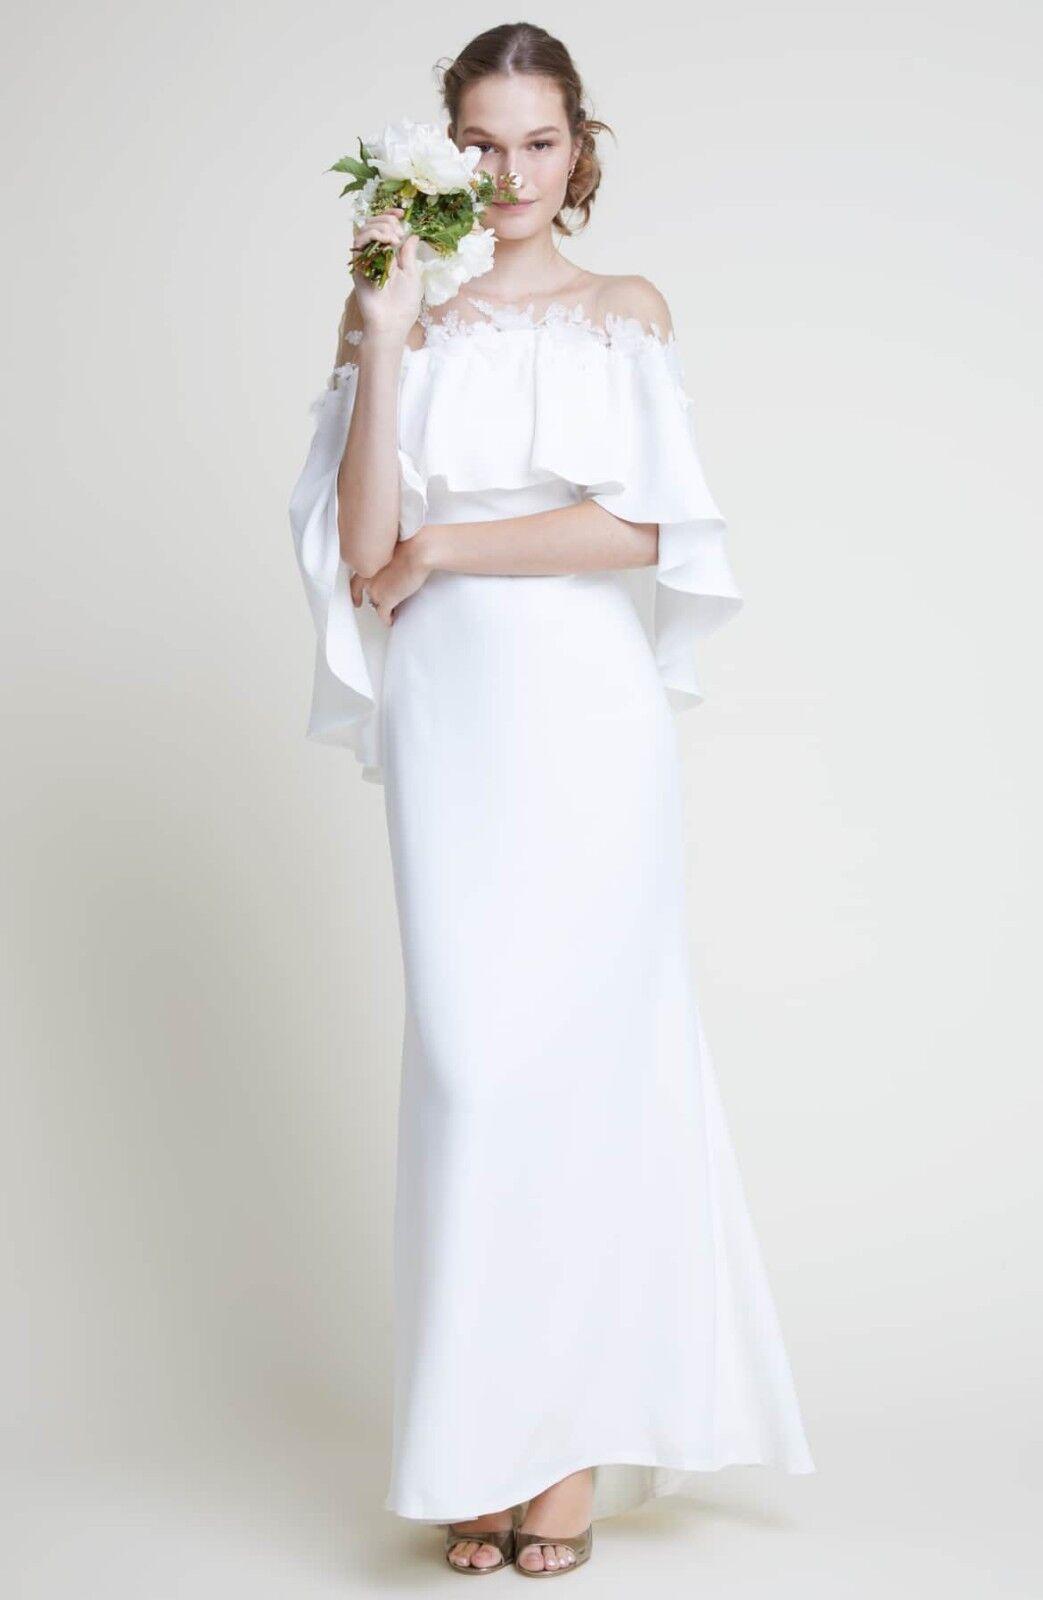 Tadashi Shoji Braut Elfenbein Floral Schulterfrei Popover Athene Abendkleid Abendkleid Abendkleid 2 049424